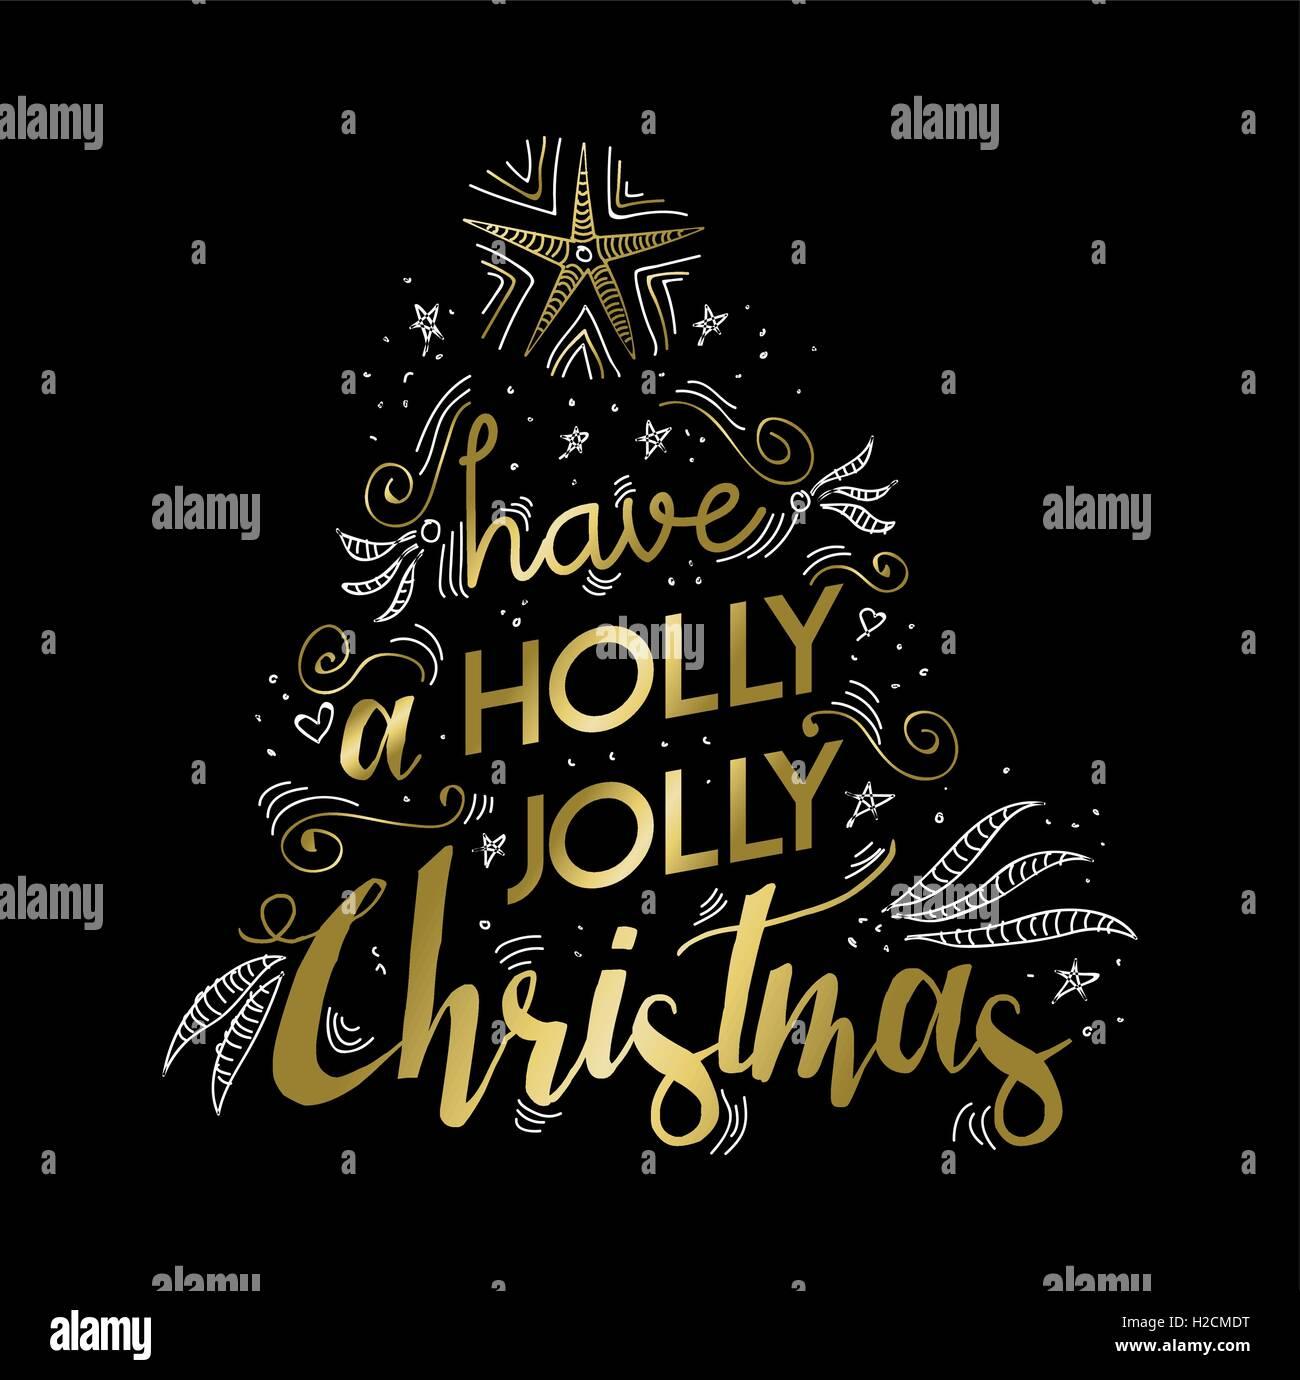 Frohe Weihnachten Gold.Frohe Weihnachten Gold Luxus Design Schriftzug Happy Xmas Wunsch